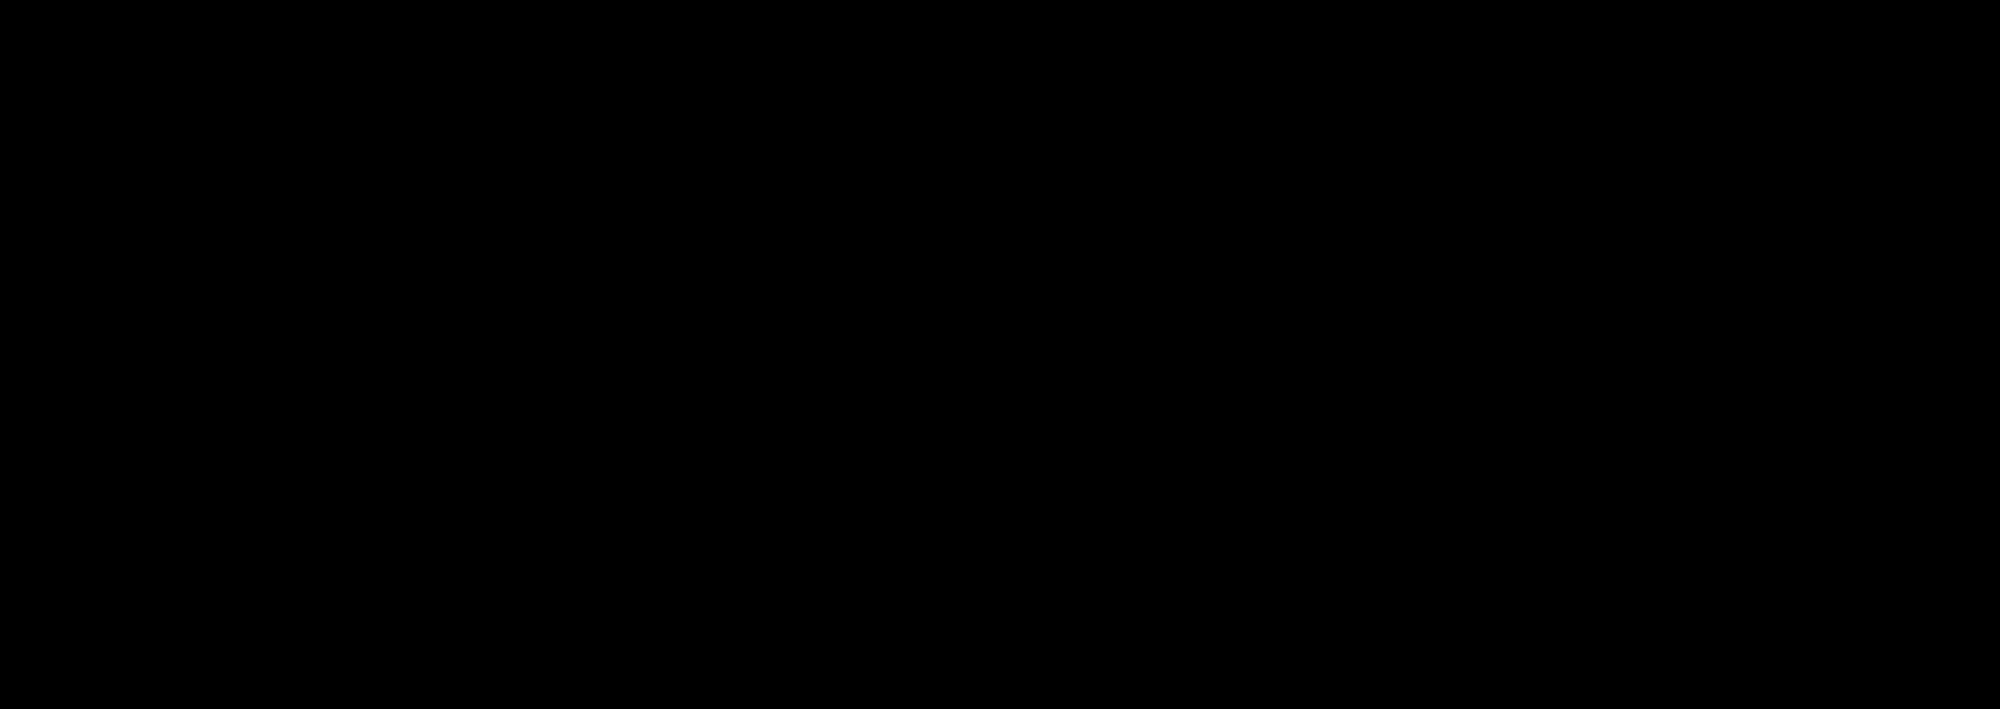 TMF11074_bg